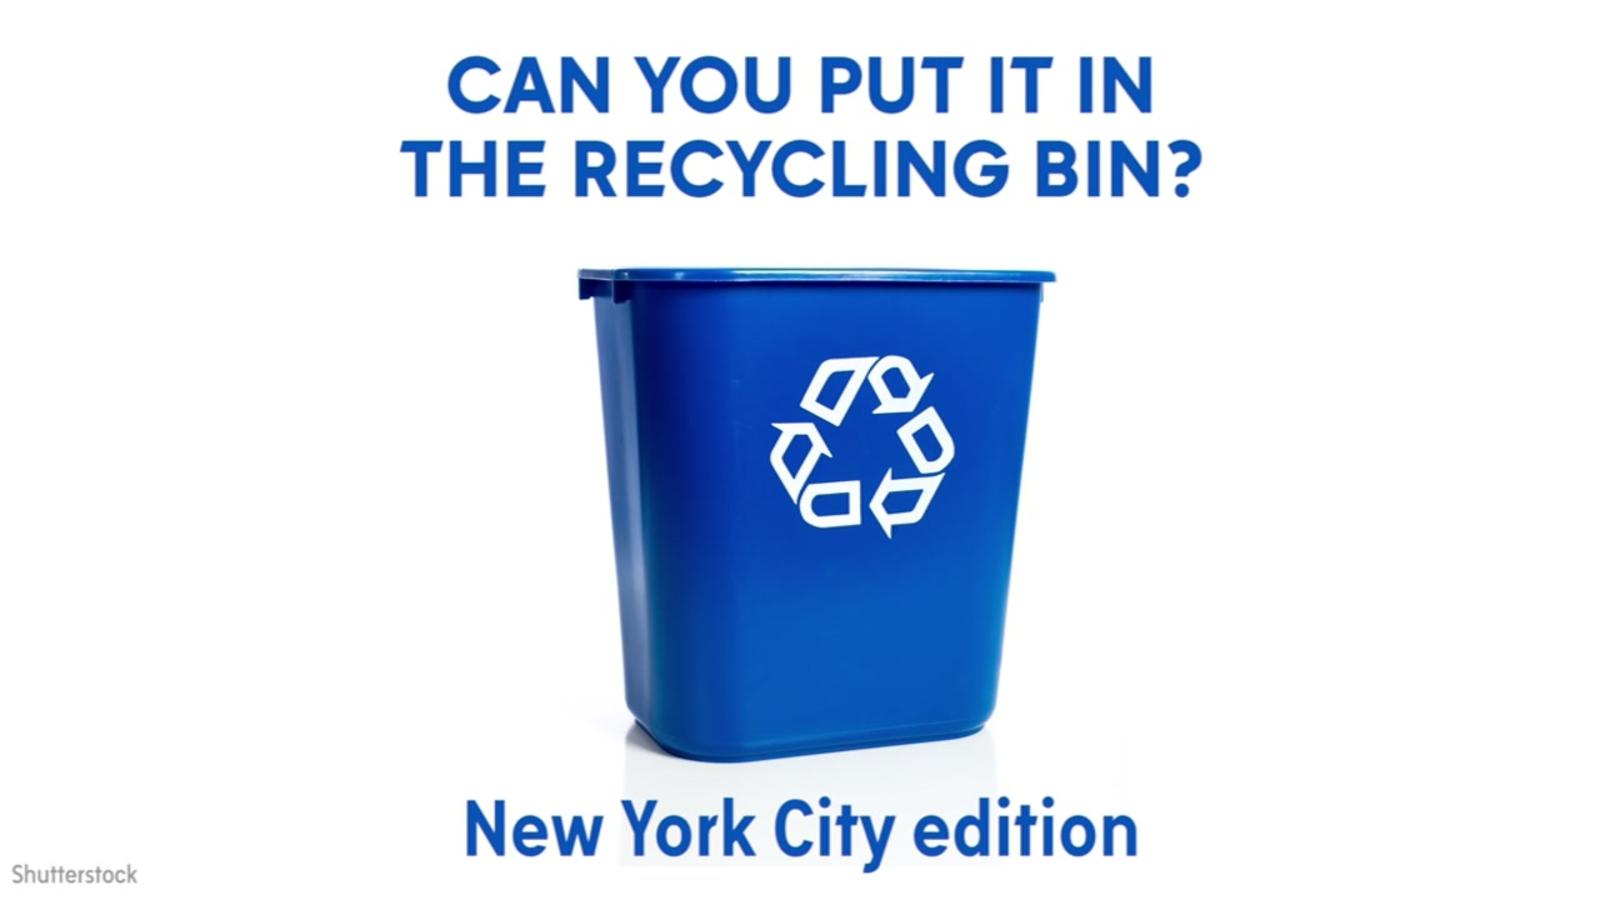 New York City recycling bin quiz